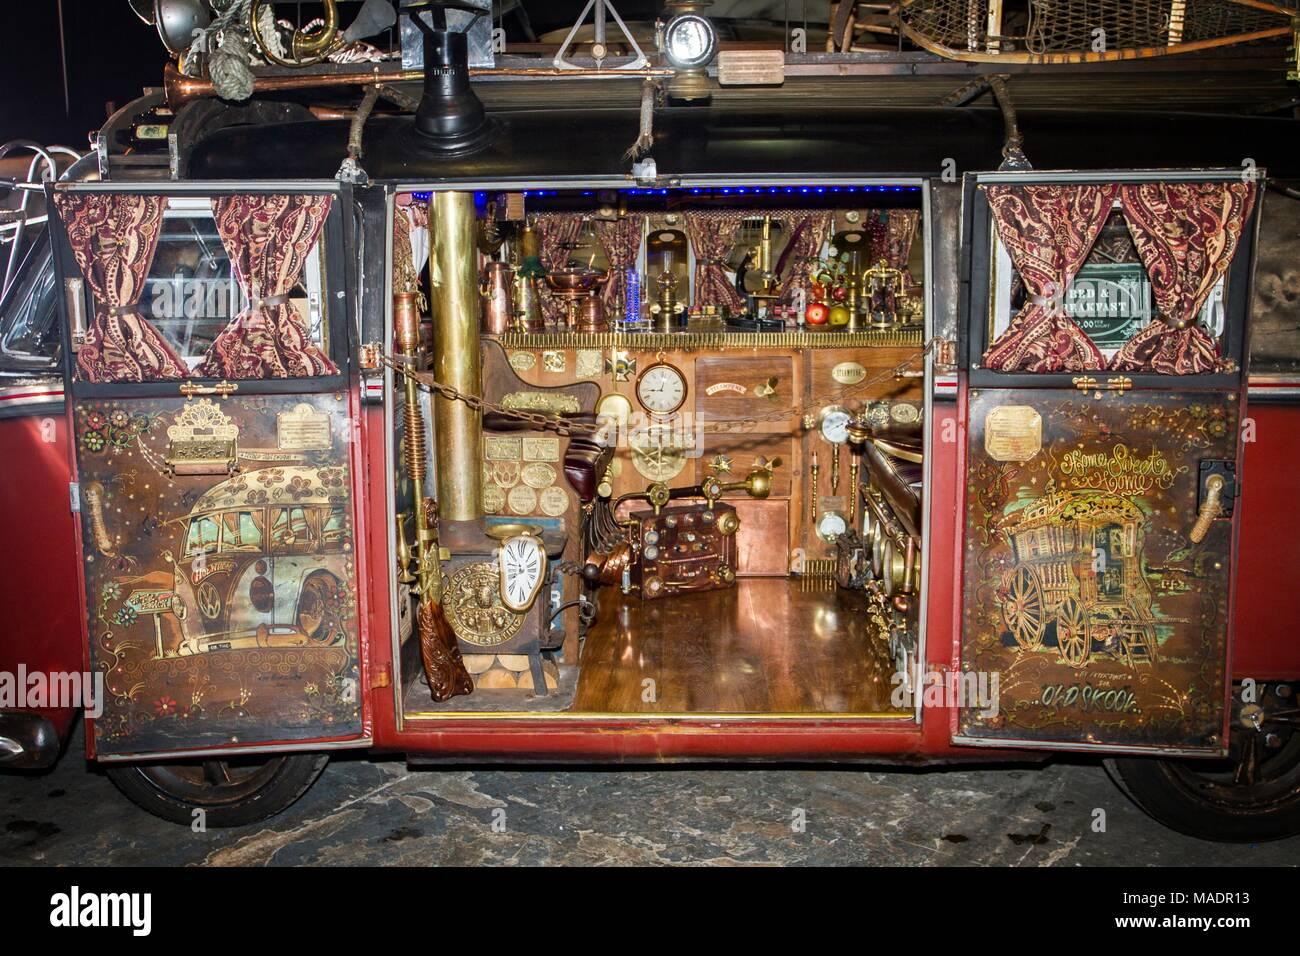 steampunk sub culture post apocalypse apocalyptic spyglas goth crossover machine machinery costume fancy dress up gothic mechanism futuristic clock - Stock Image